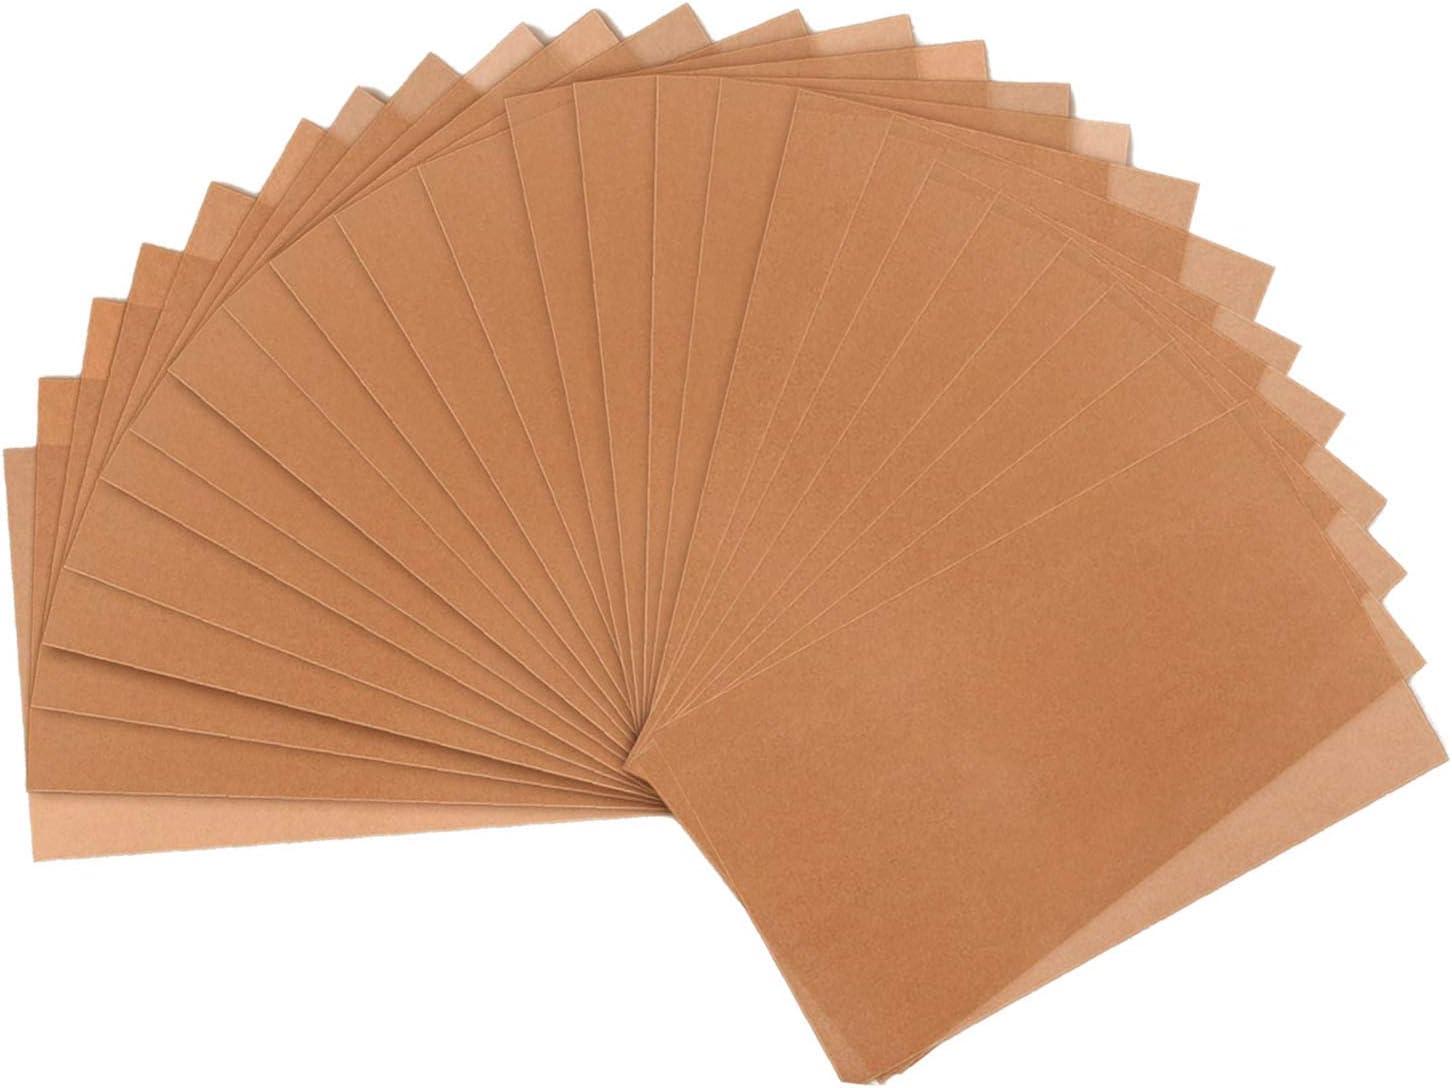 Parchment Paper Cookie Baking Sheets 12 x 16 - Baking Paper Sheets Precut for Non-Stick Unbleached, Safe for High Temperature Baking 100pcs